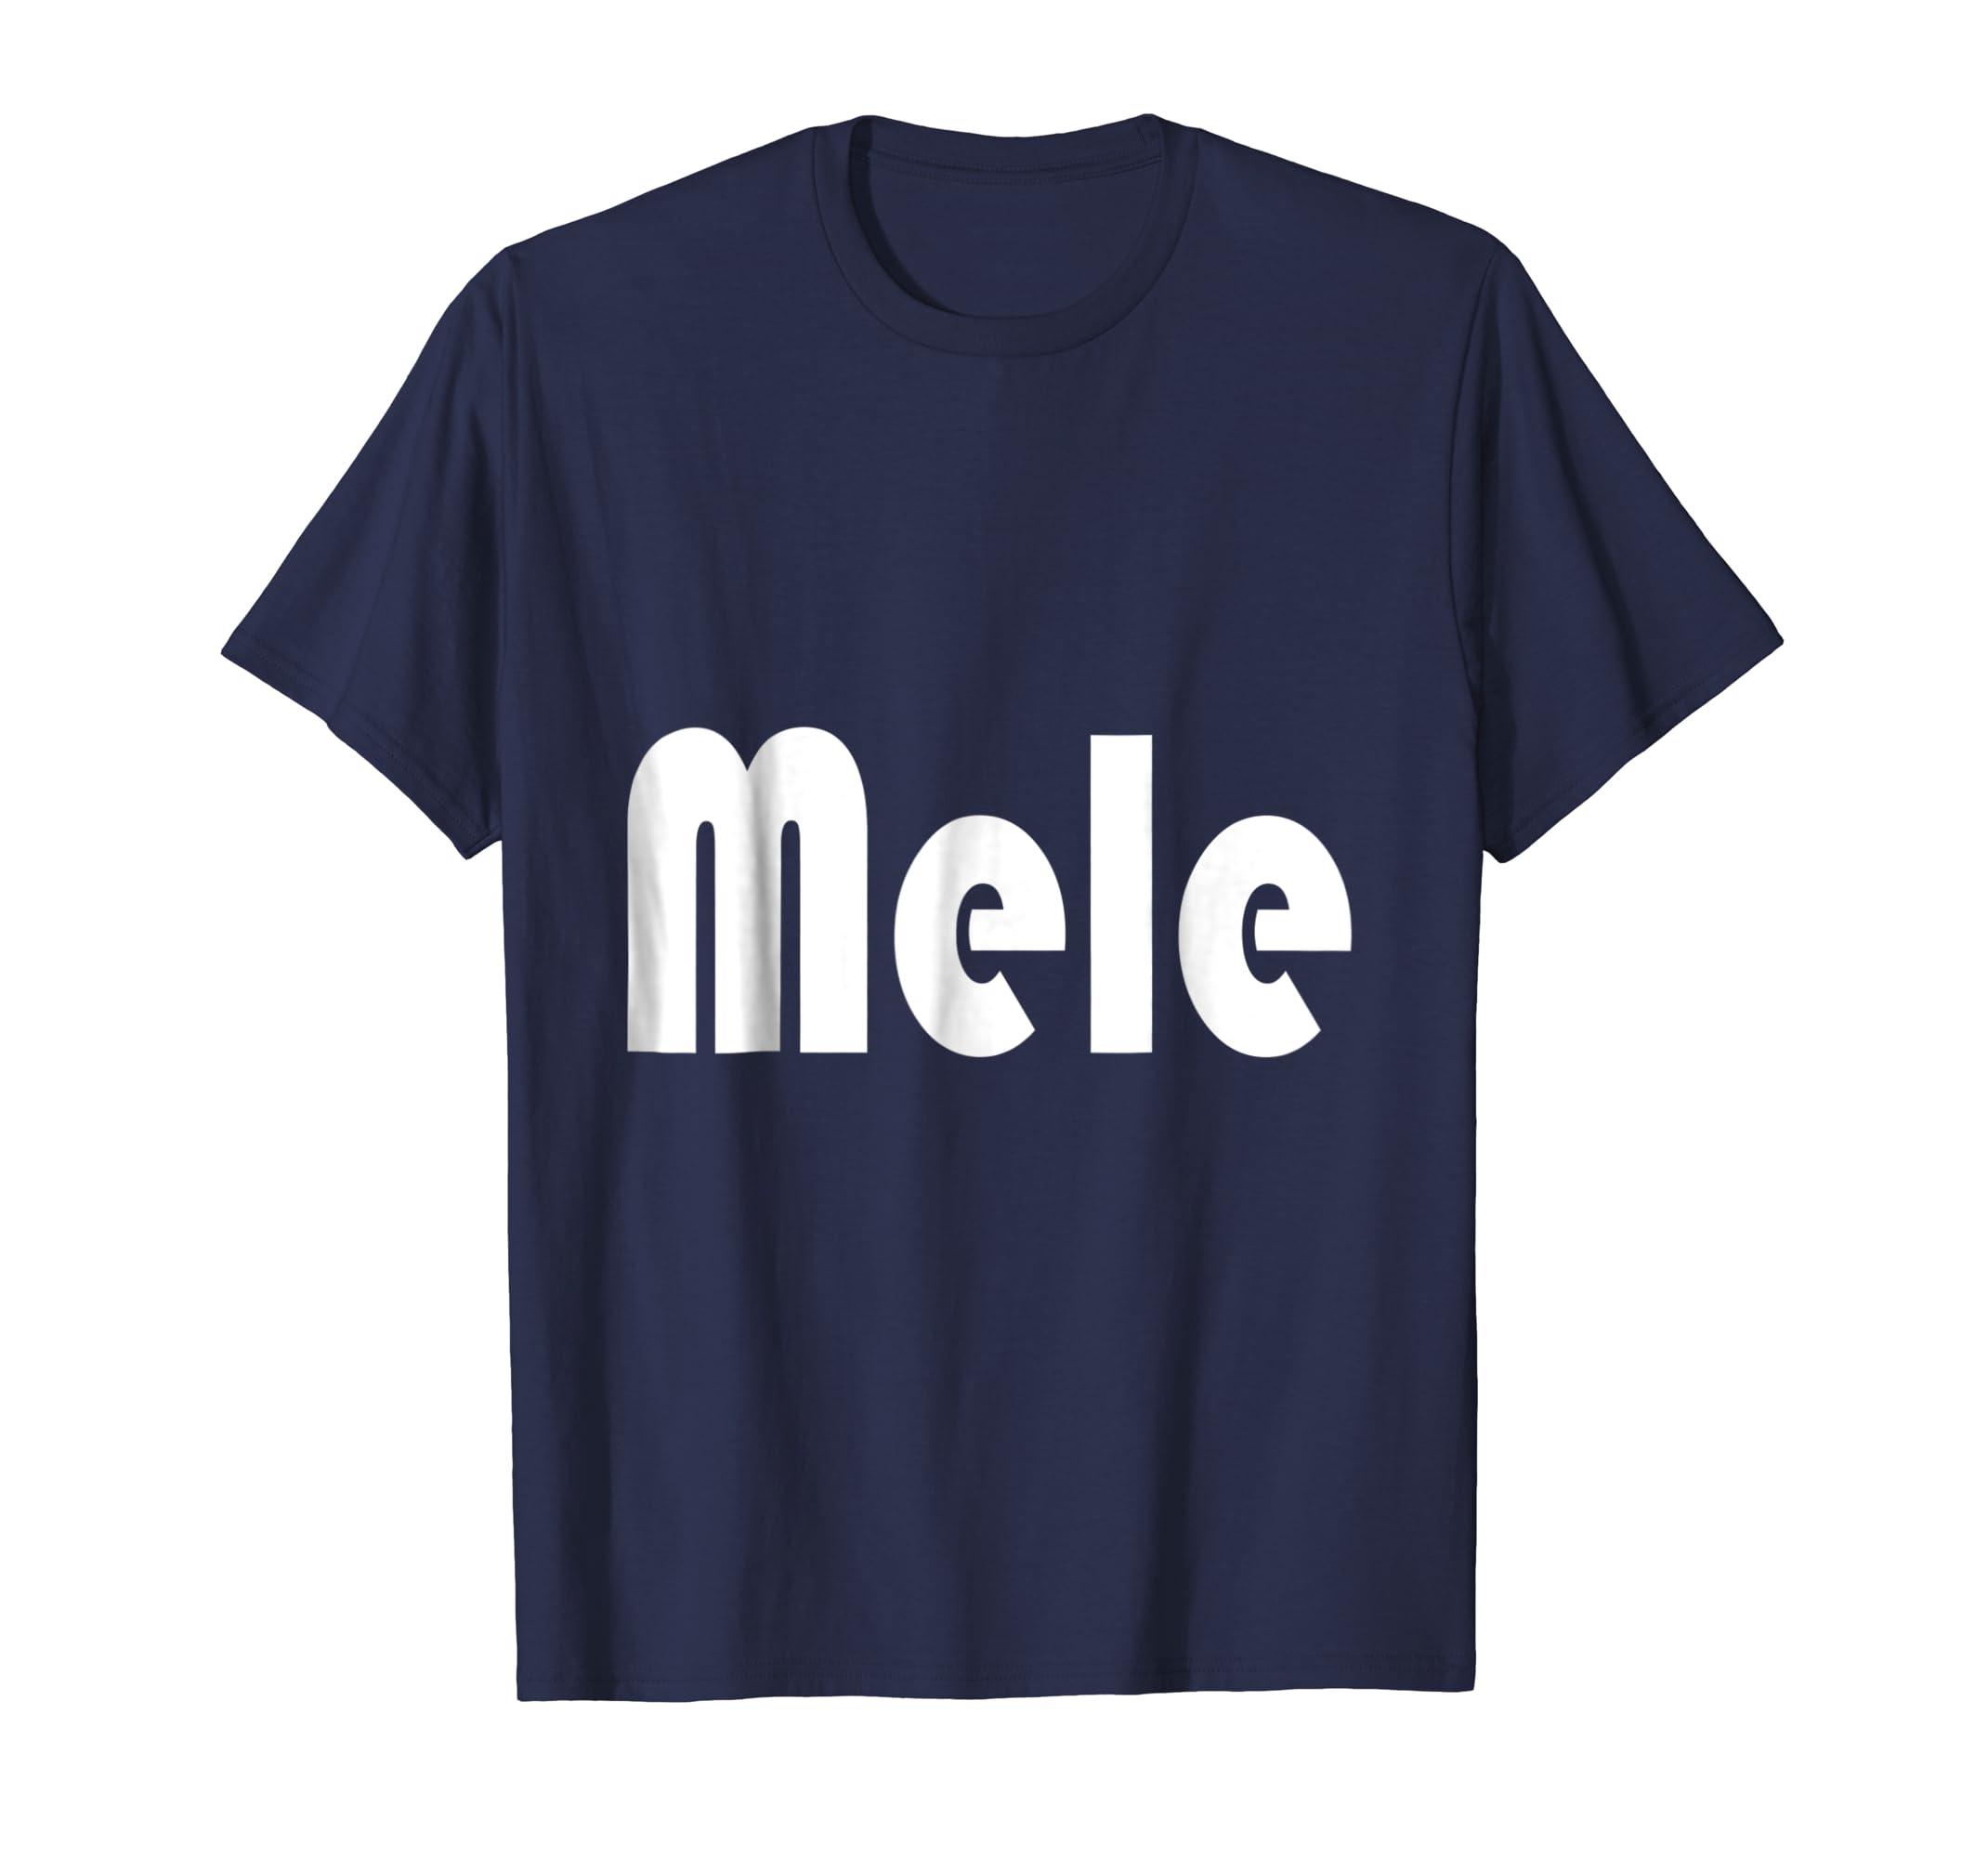 (Mele)Part of a Matching Family T Shirt Set of Penguins-azvn